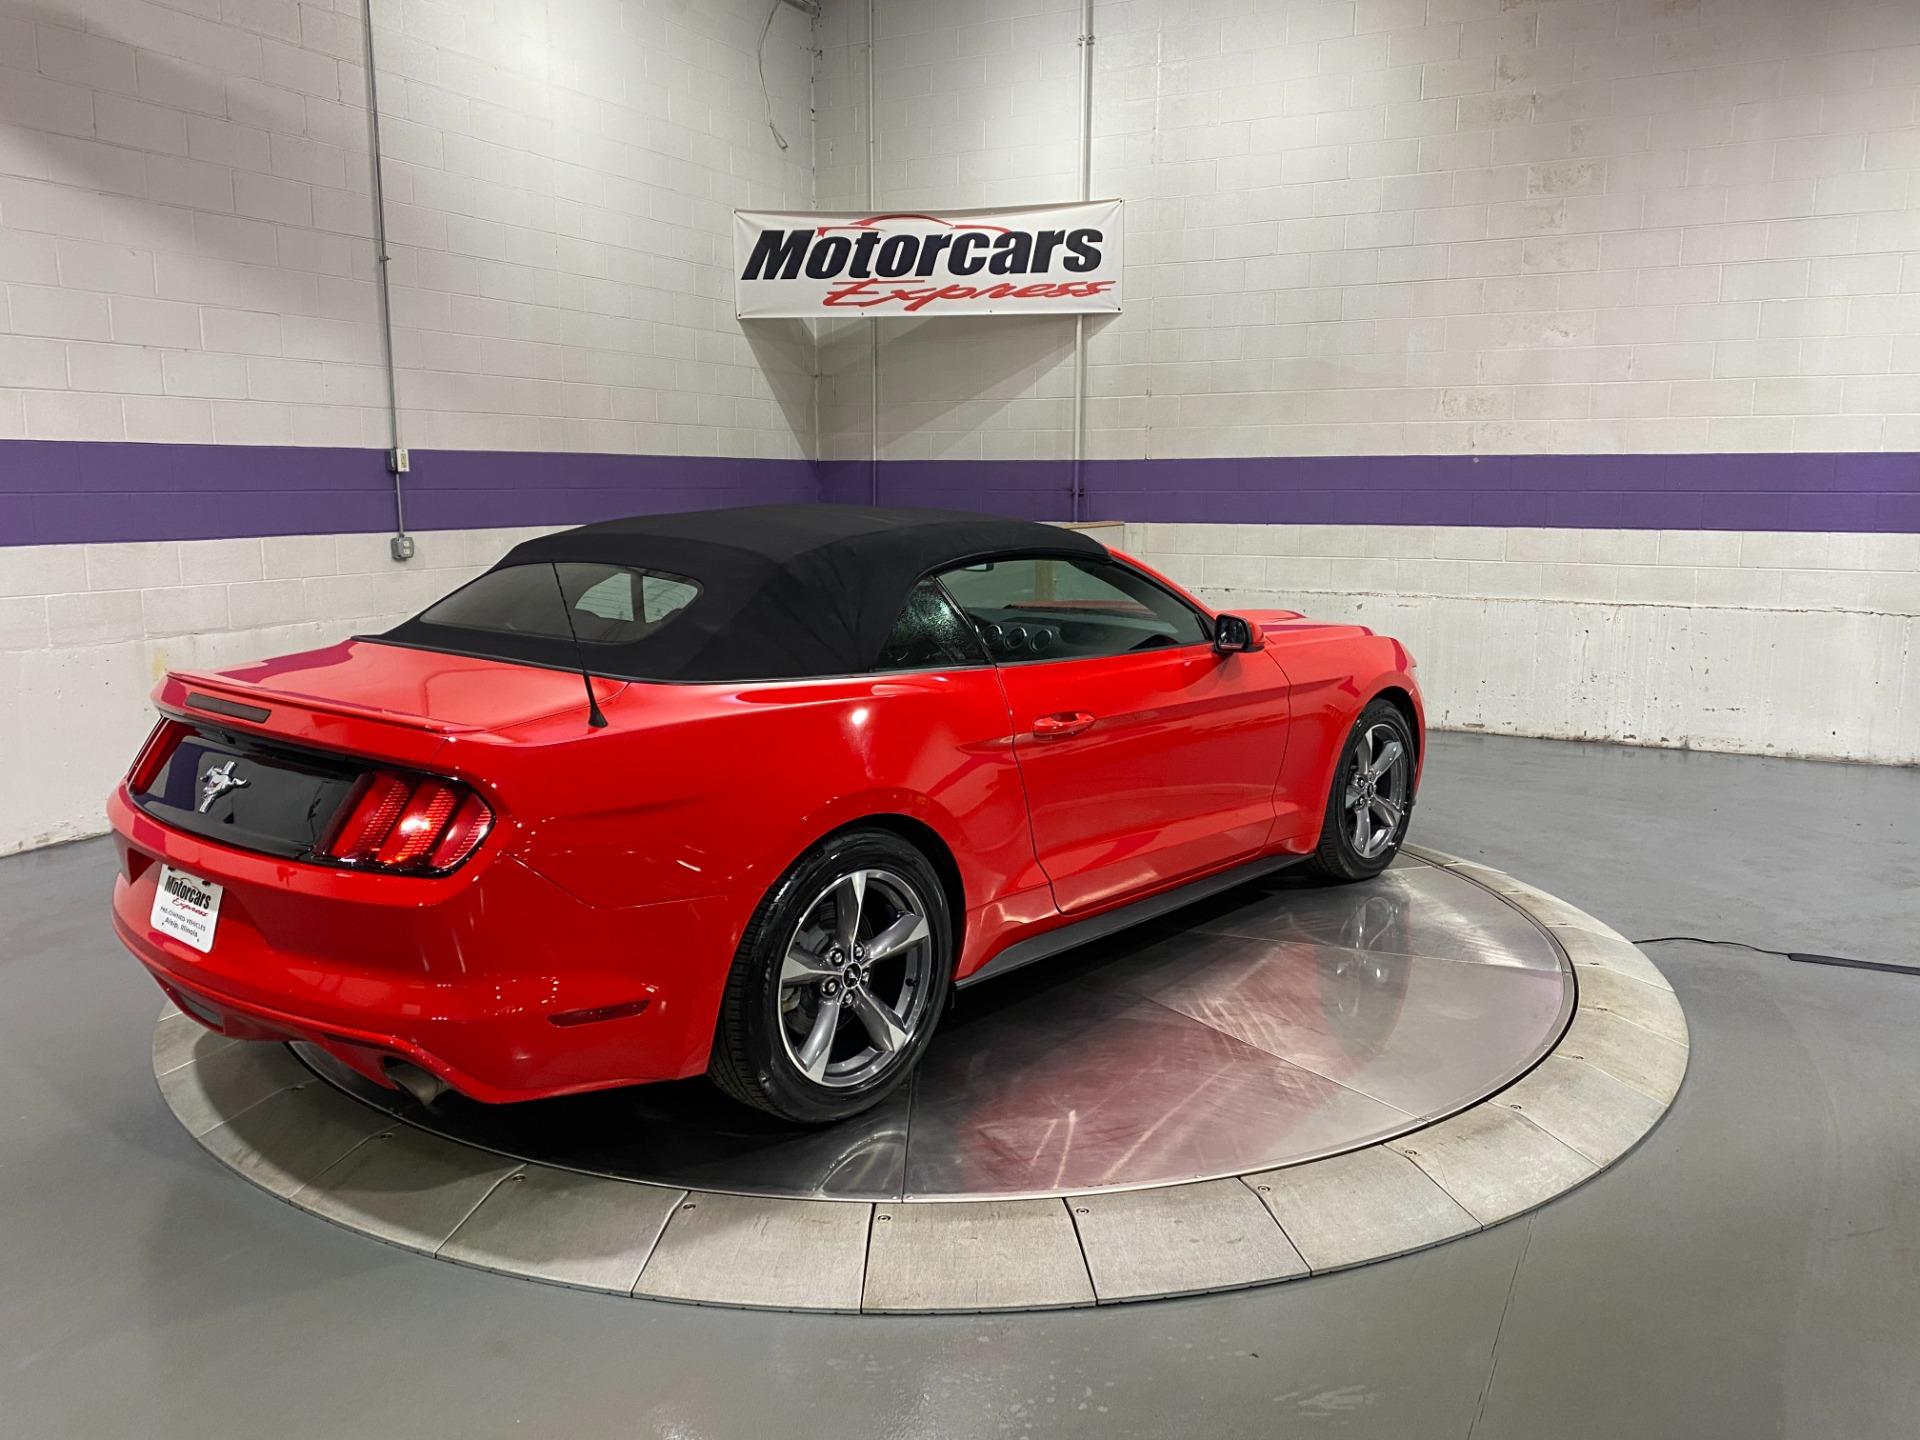 Used-2017-Ford-Mustang-Convertible-V6-RWD-Manual